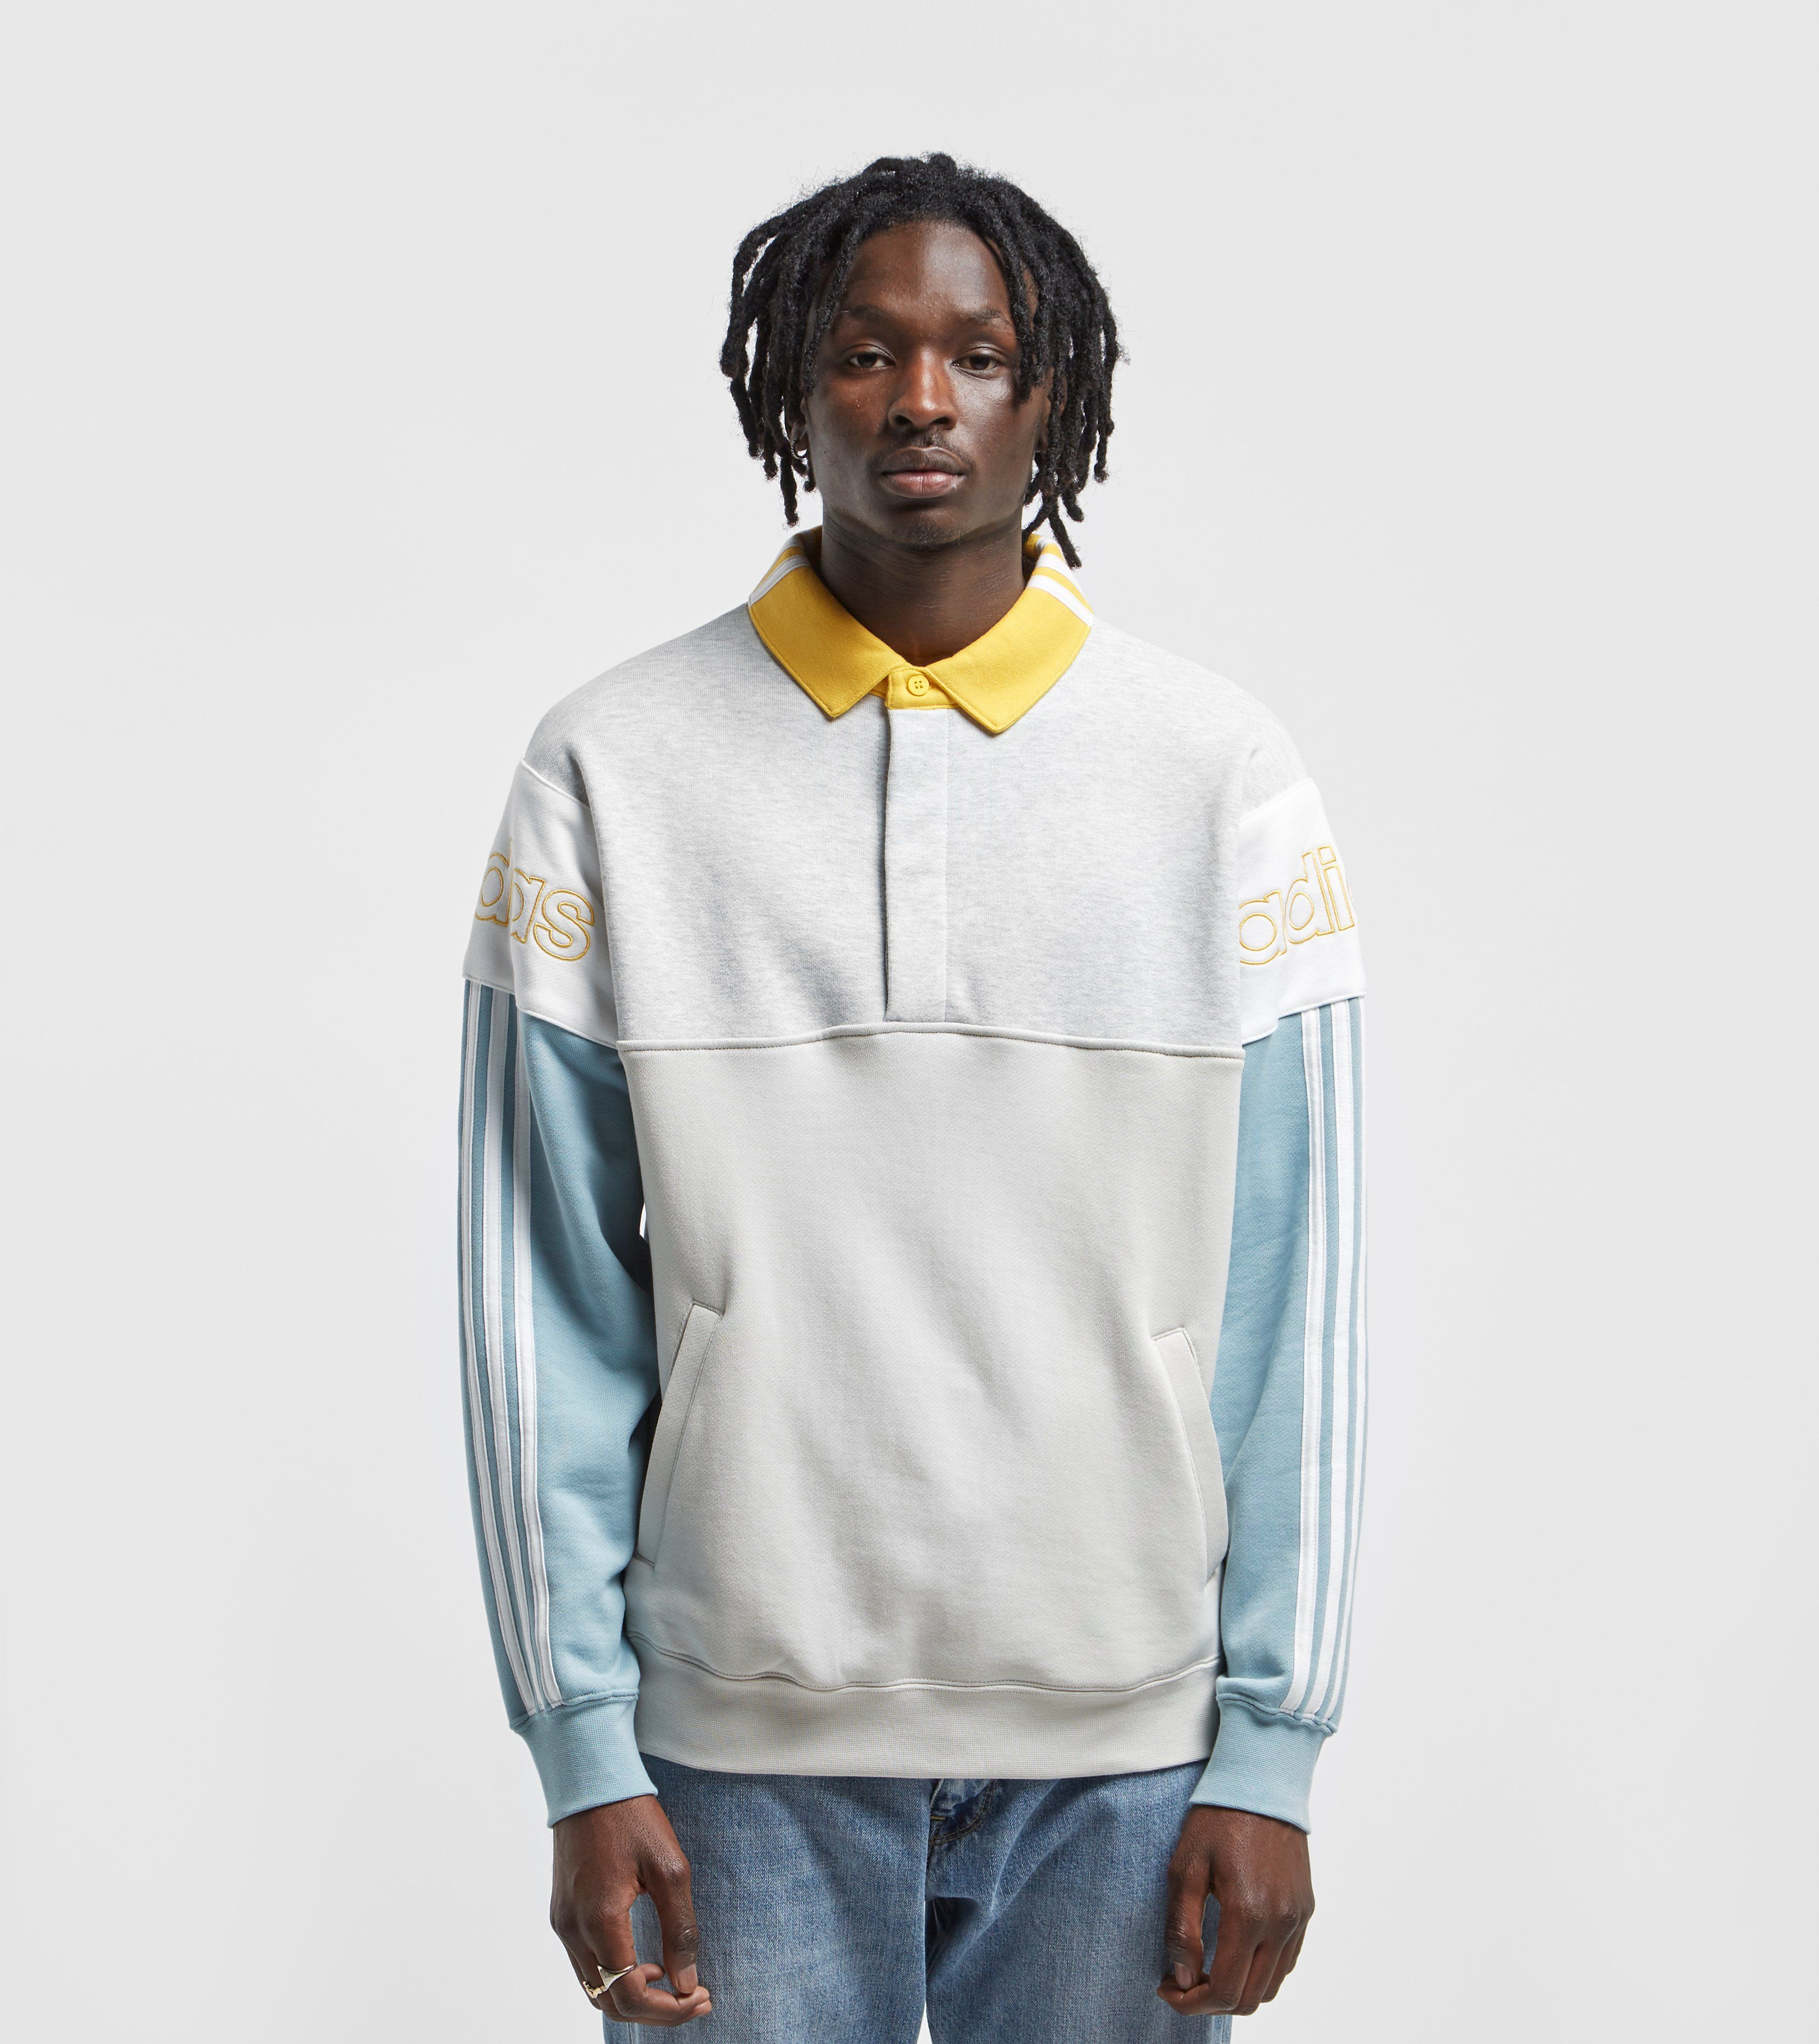 Adidas Originals Rugby Sweatshirt by Adidas Originals